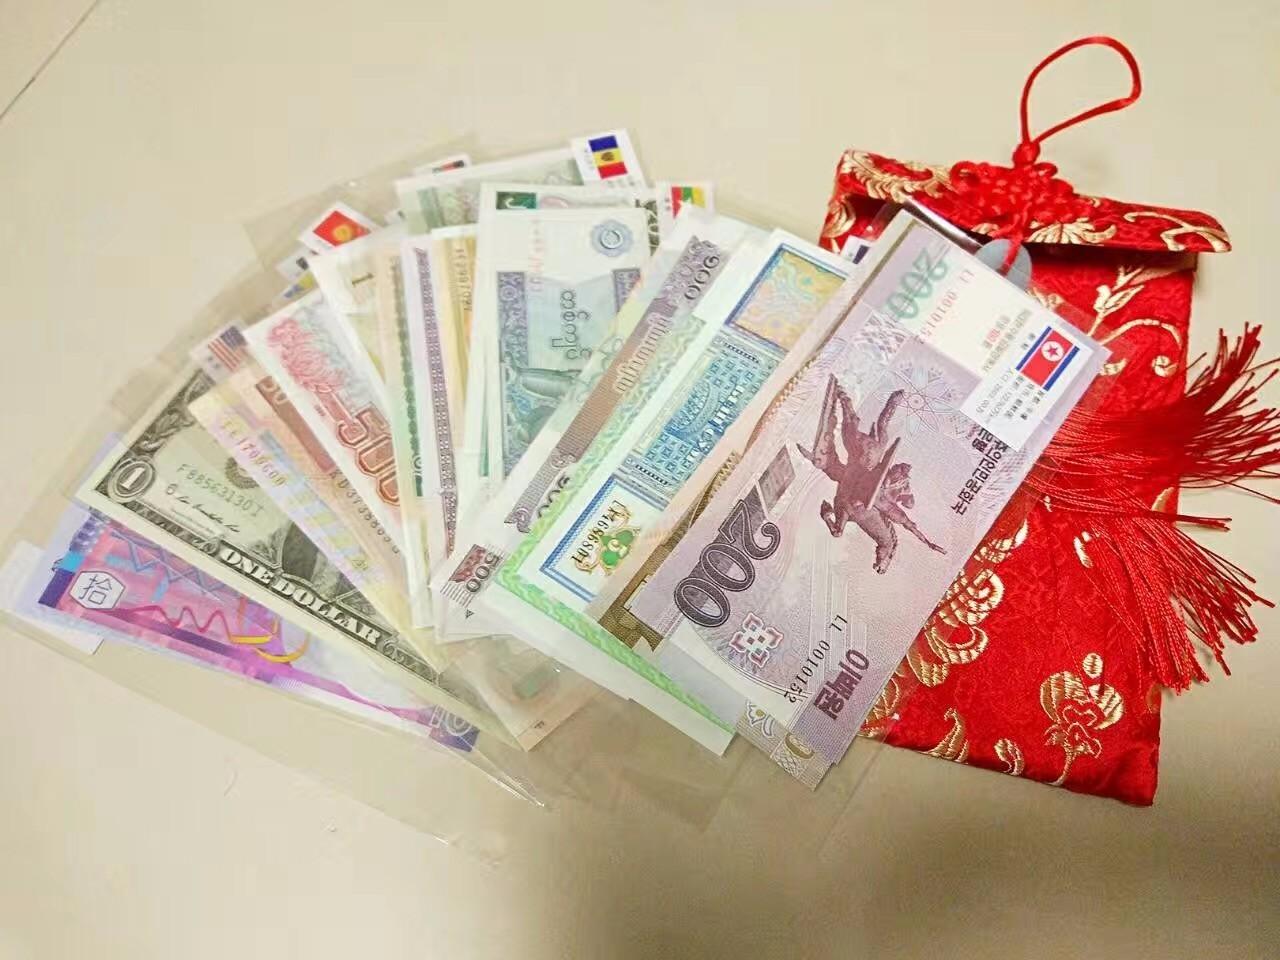 Money多少不重要,结婚我只收这样的红包!